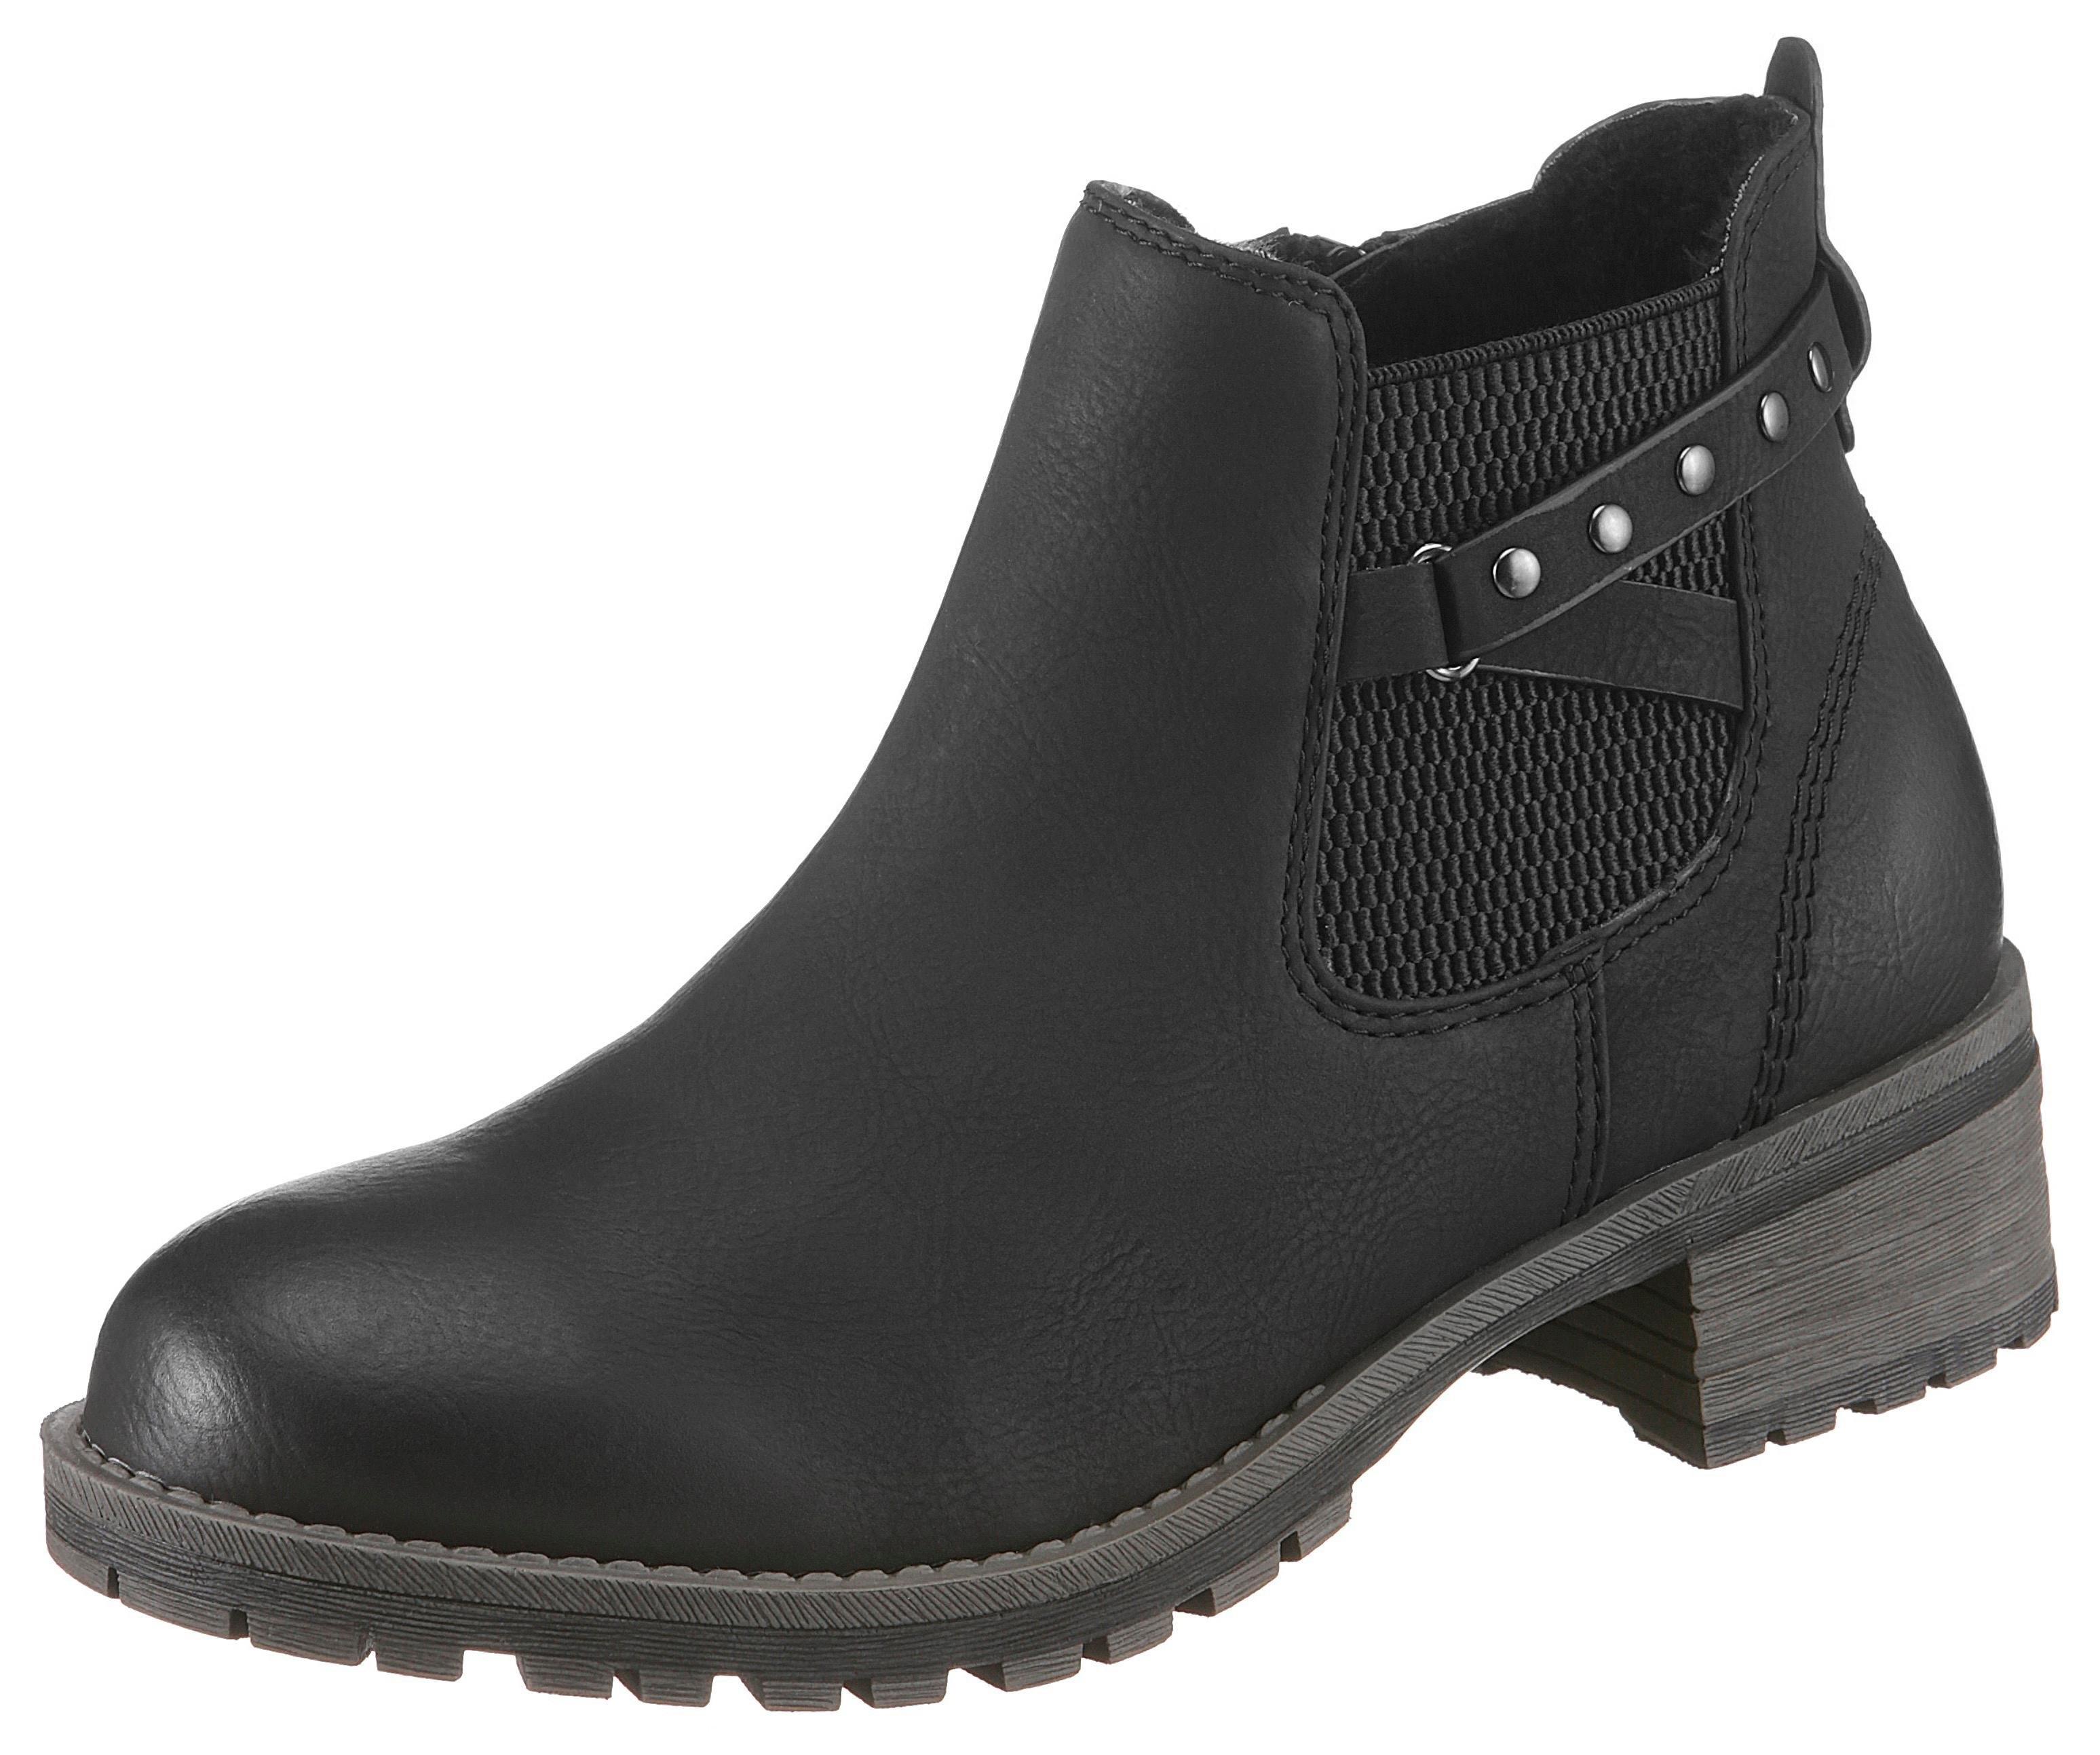 City Walk chelsea-boots - verschillende betaalmethodes